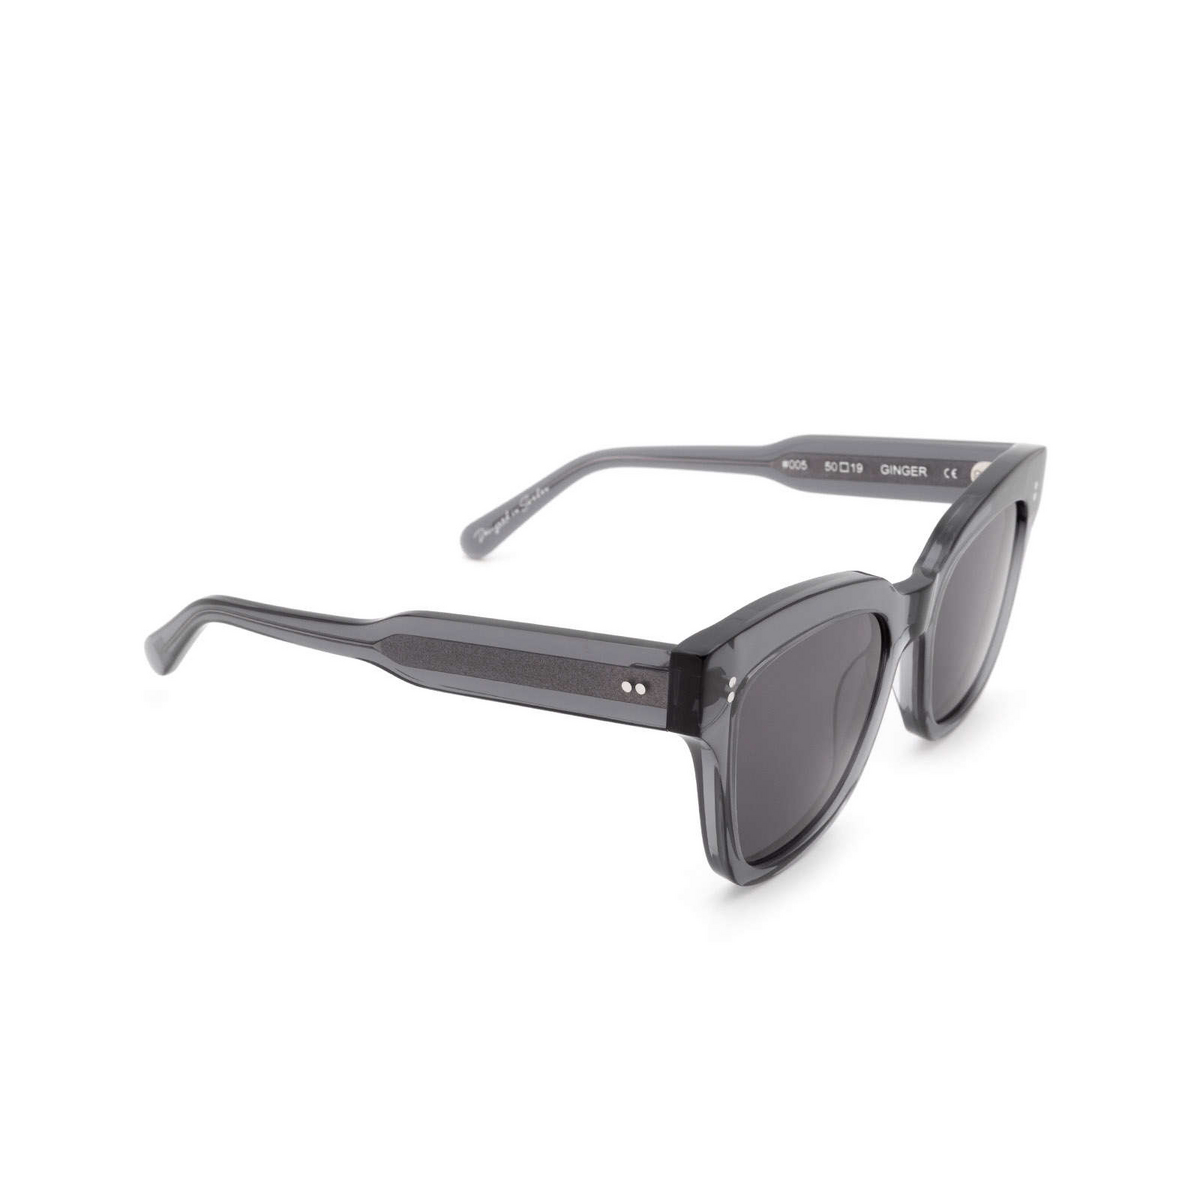 Chimi® Square Sunglasses: #005 color Grey Ginger.